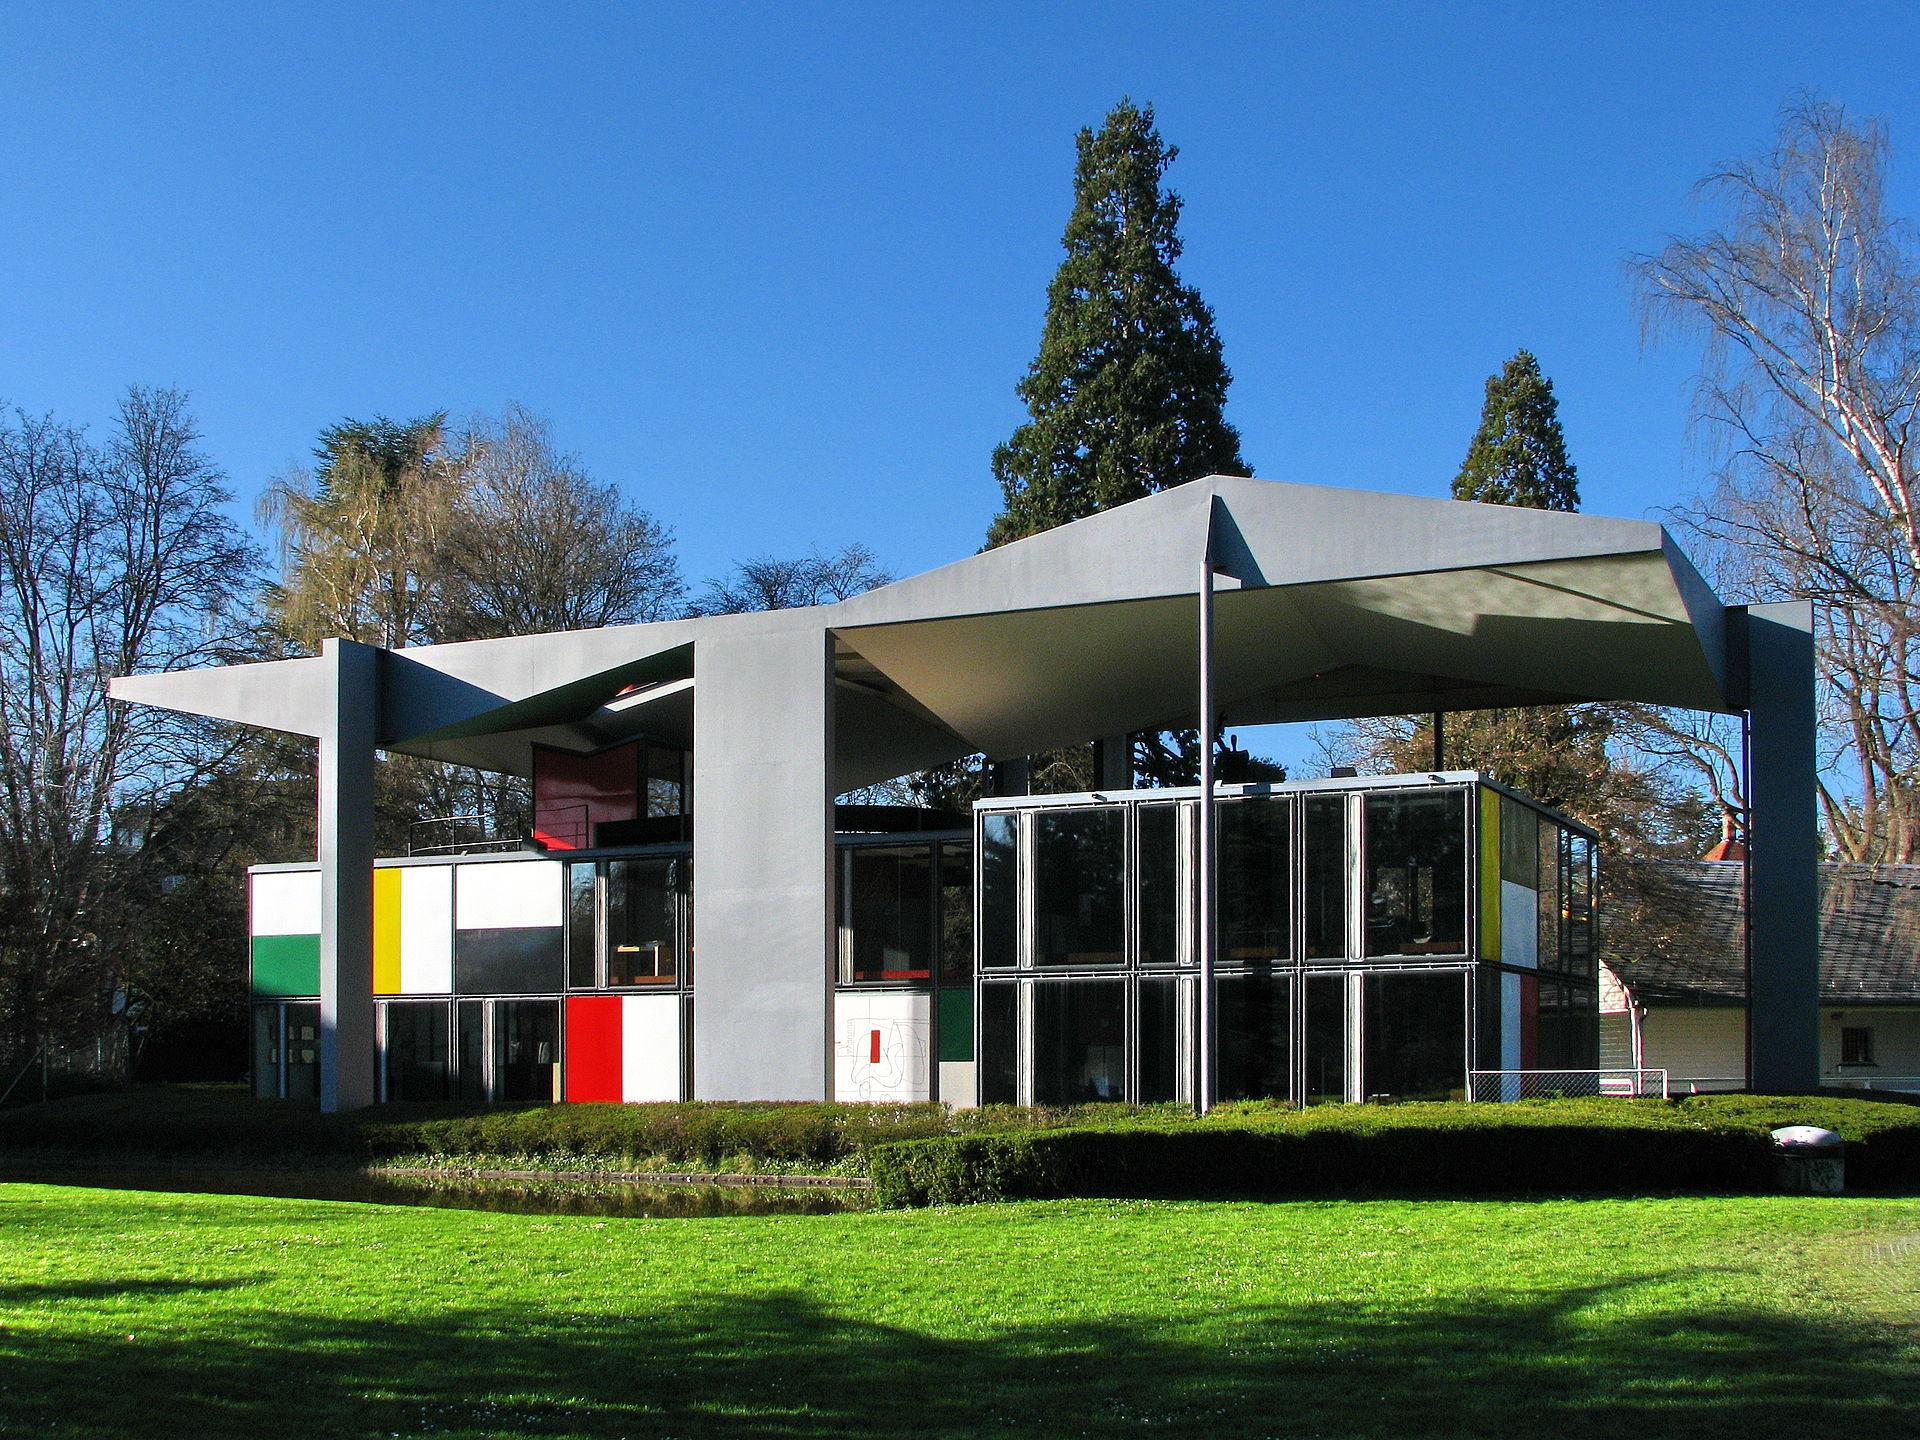 Zürich_-_Seefeld_-_Centre_Le_Courbusier_IMG_1111_ShiftN